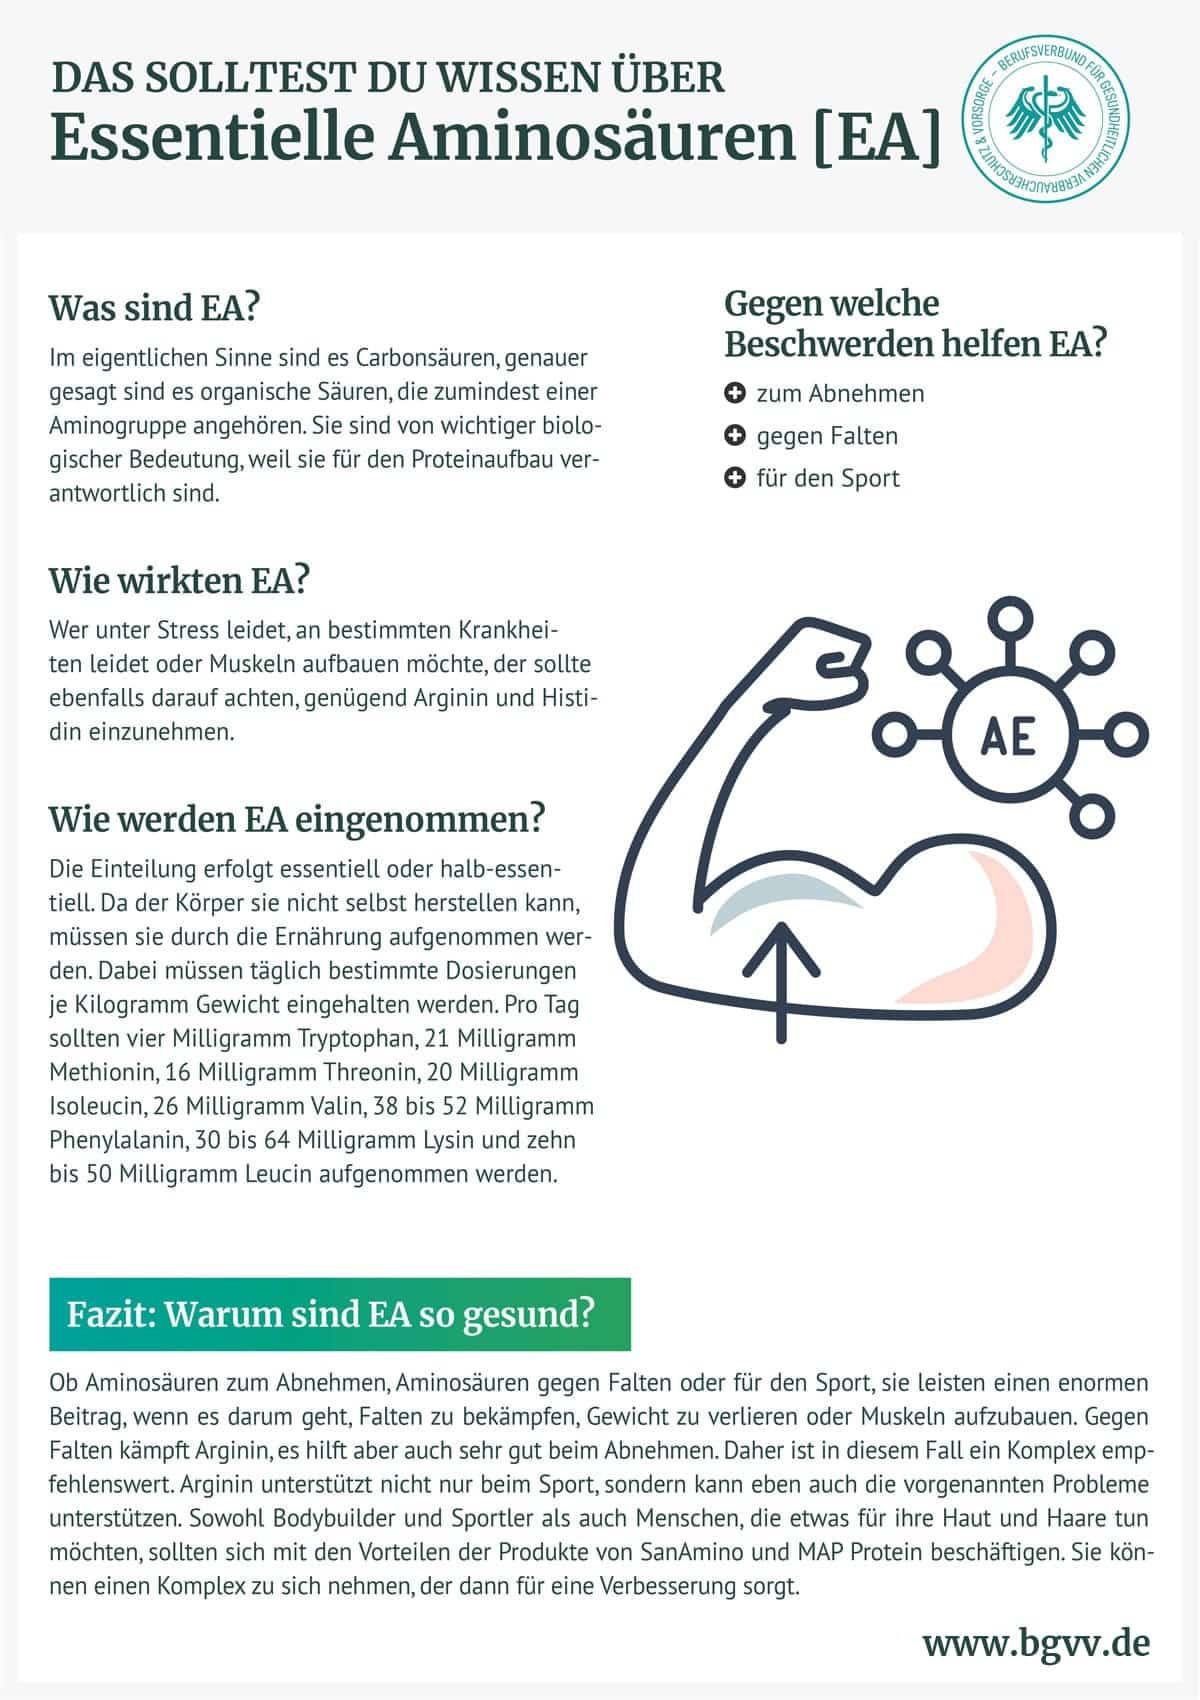 BGVV Essentielle Aminosäuren Infografik